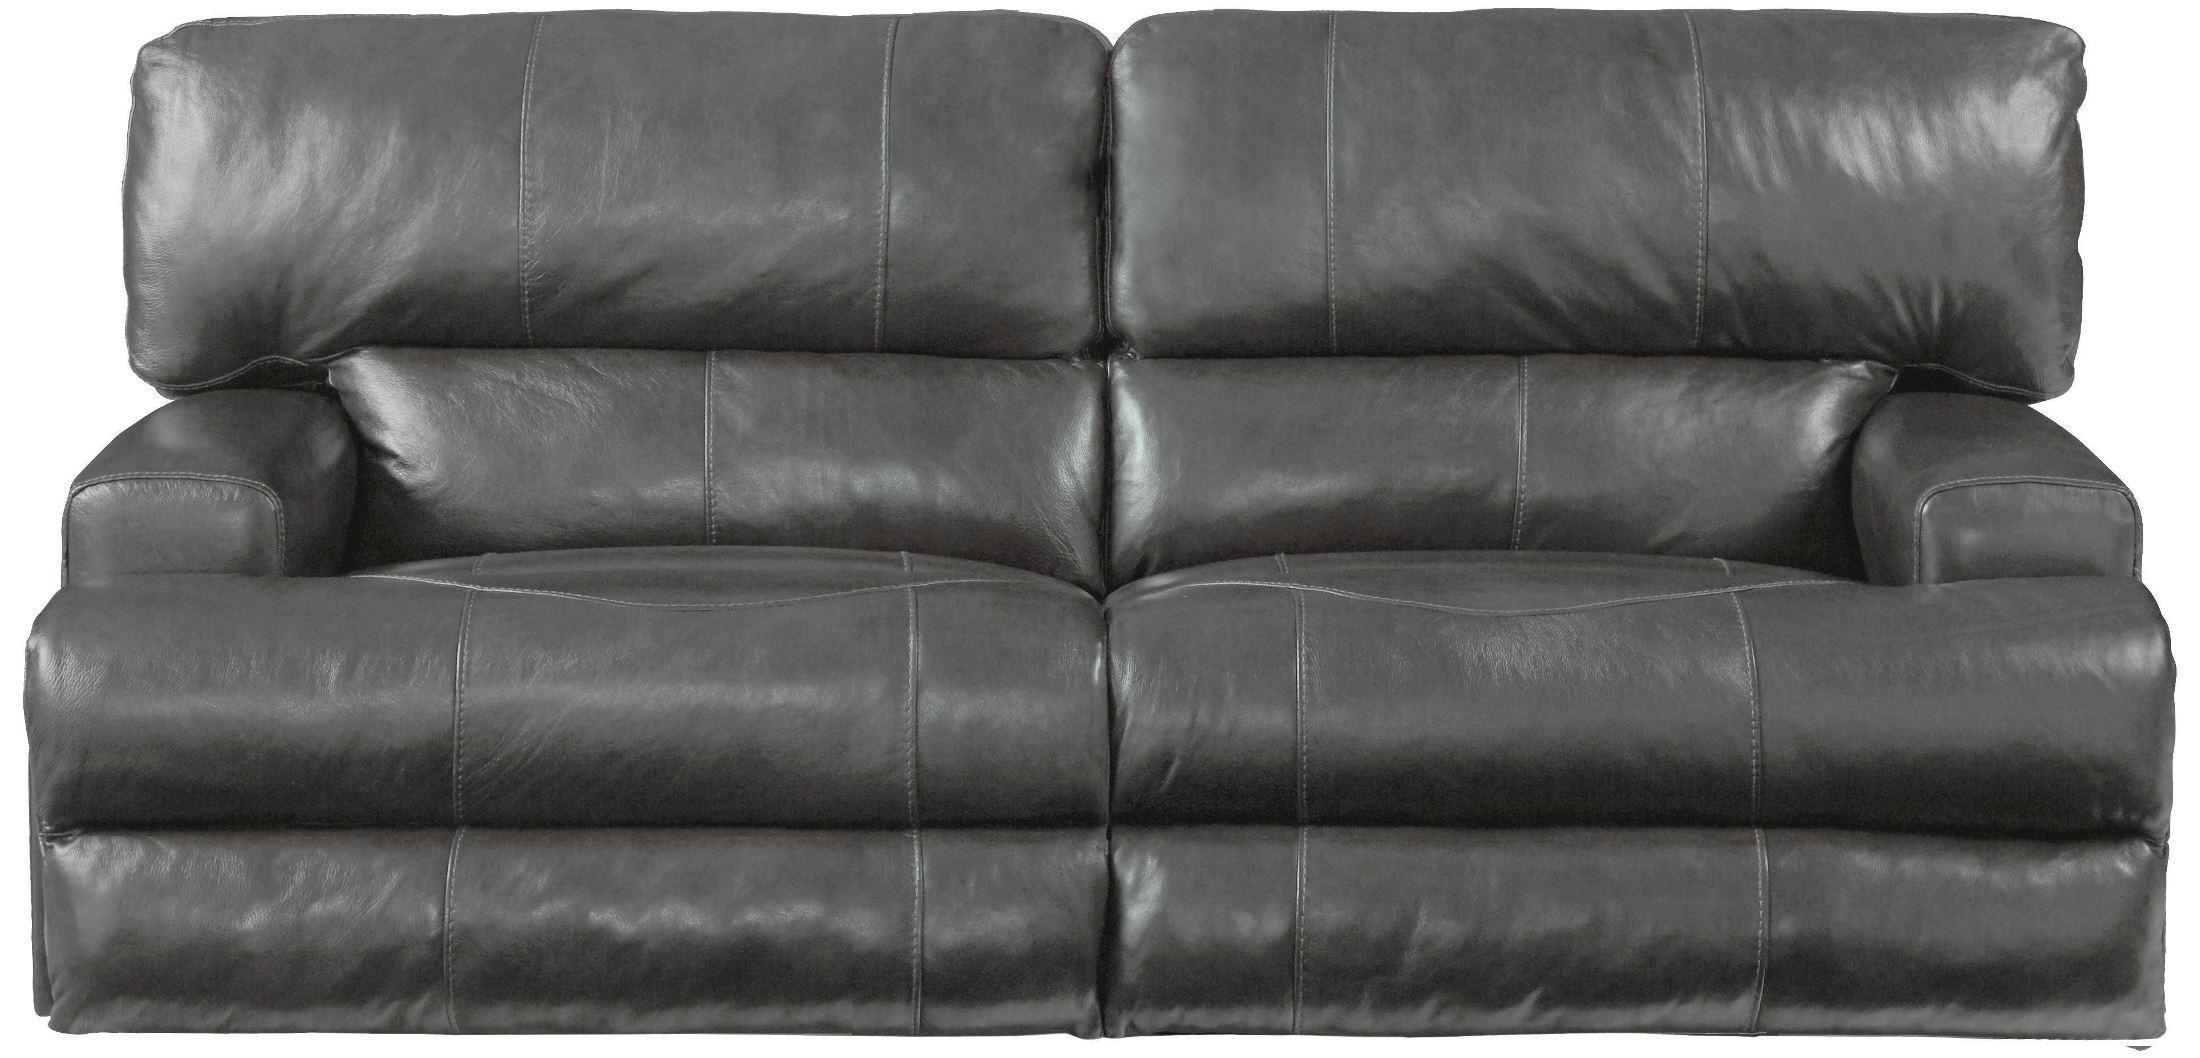 Wembley Steel Power Lay Flat Reclining Sofa From Catnapper